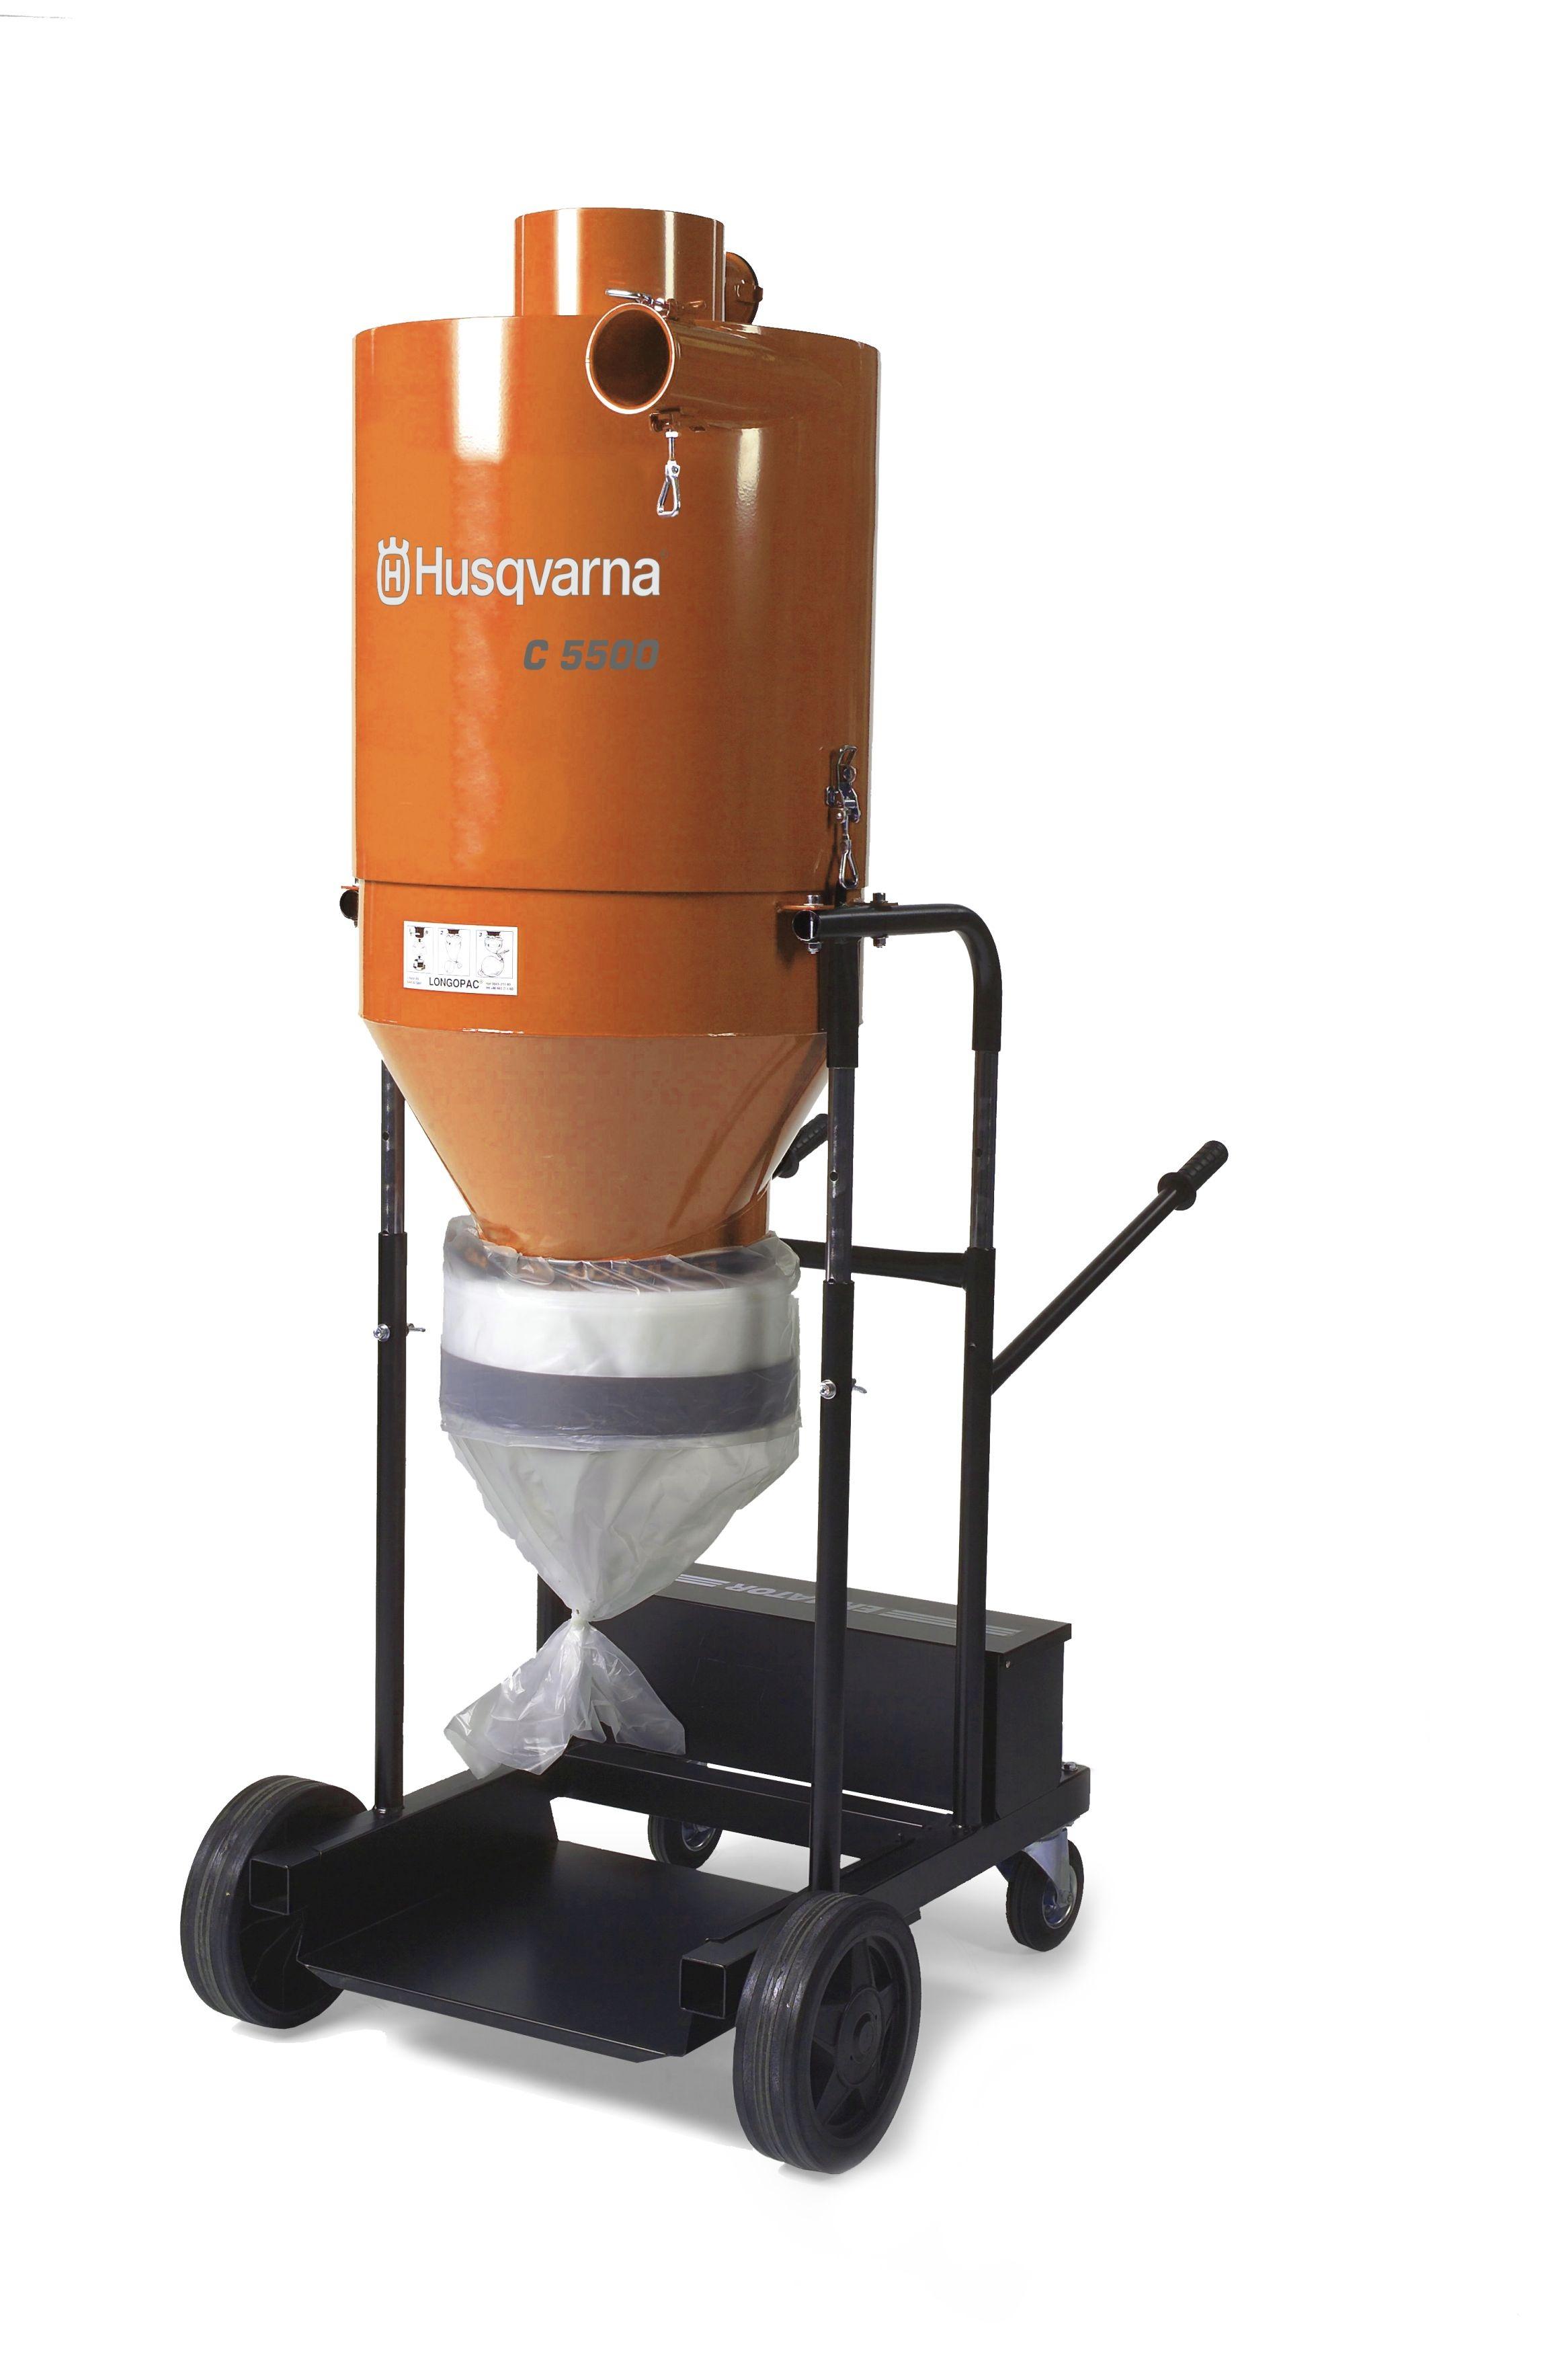 Husqvarna C 5500 Pre-Separator (T SERIES)